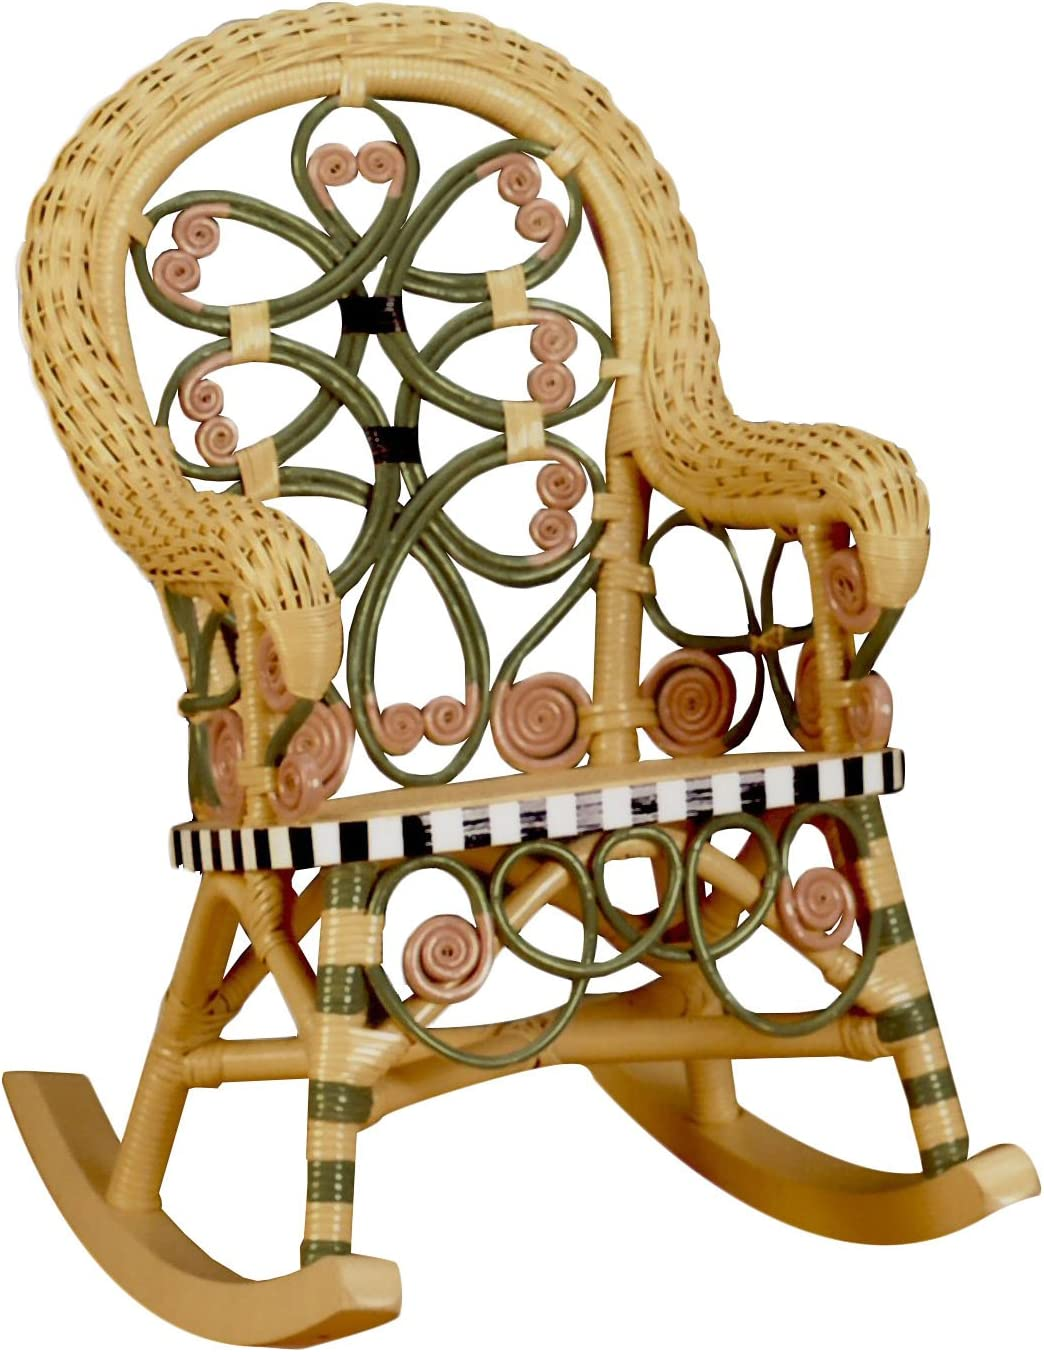 Spice Islands Victorian Child's Rocker, Carousel